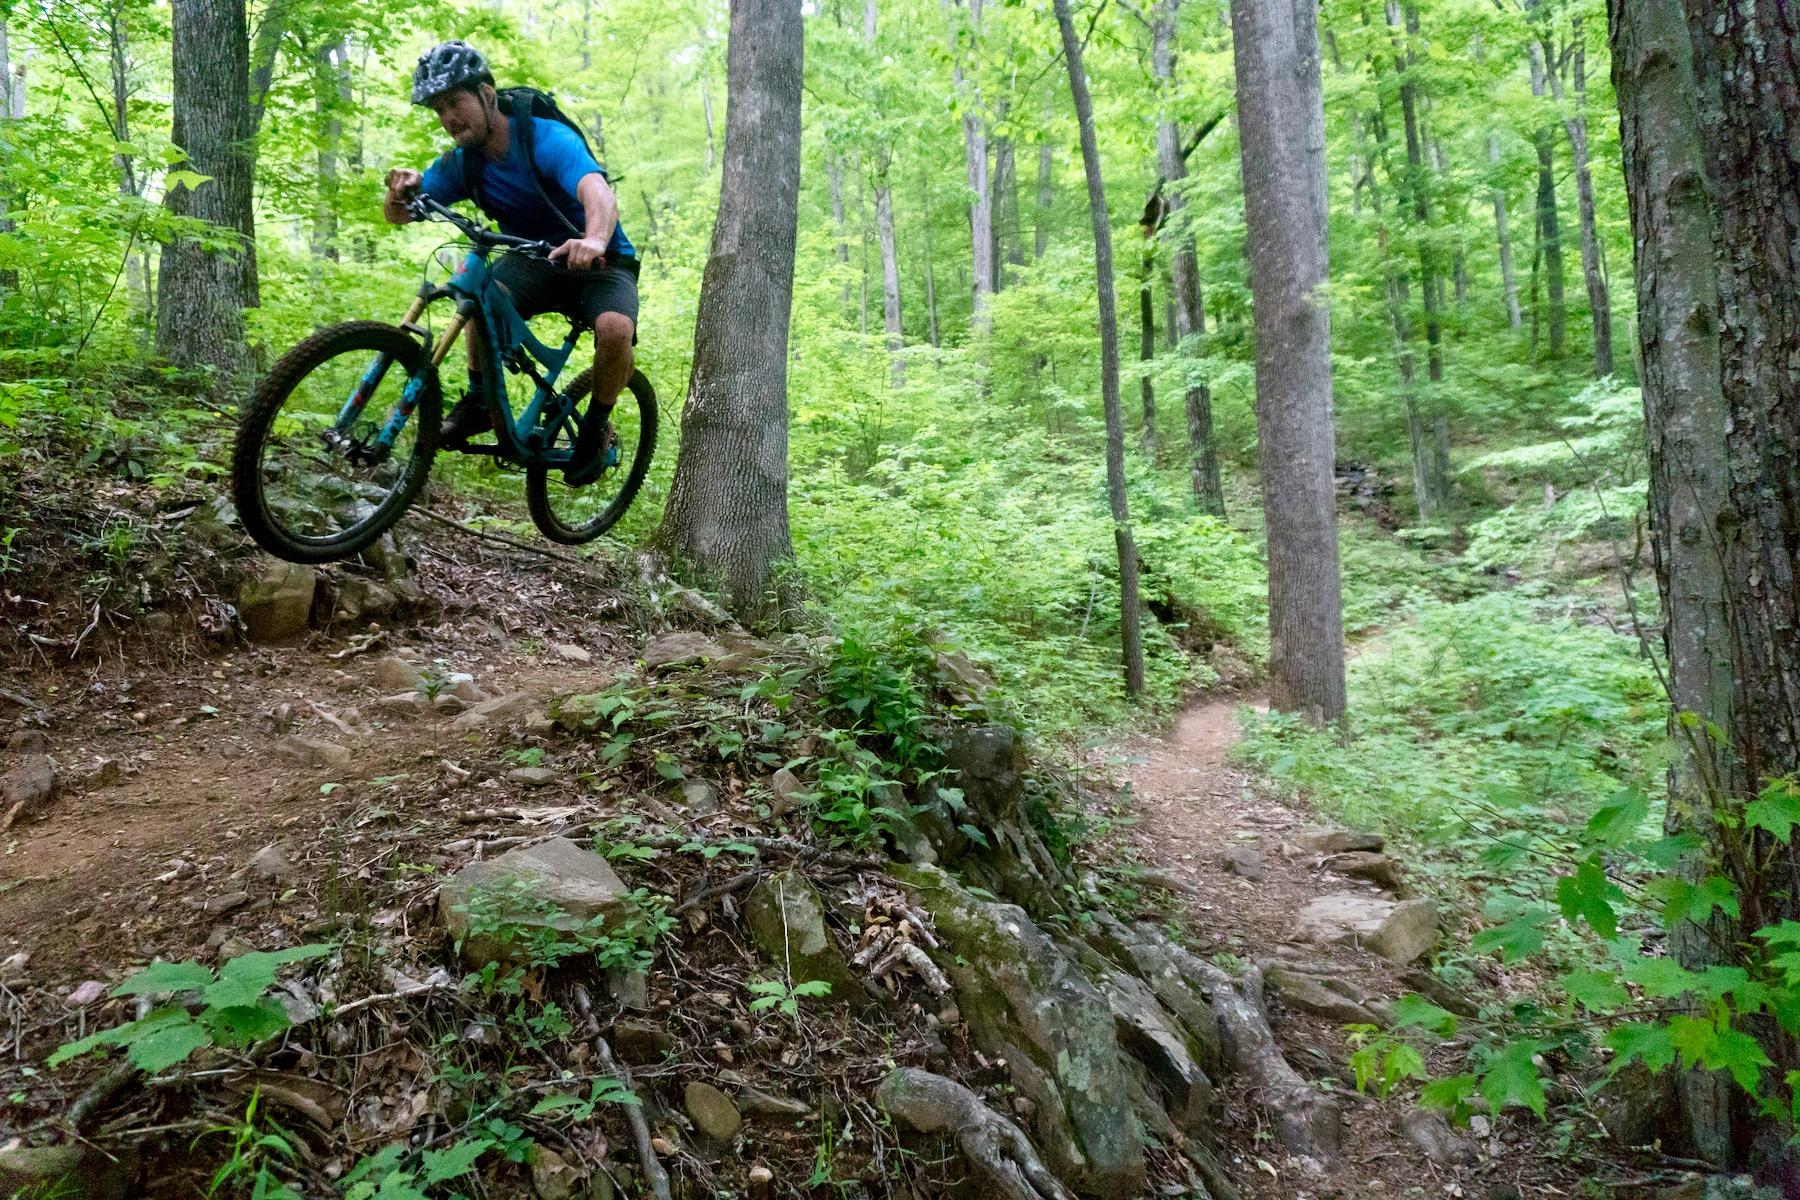 The Pivot Mach 6 Carbon Mocks Rocks and Roots [Bike Review] - Singletracks Mountain Bike News